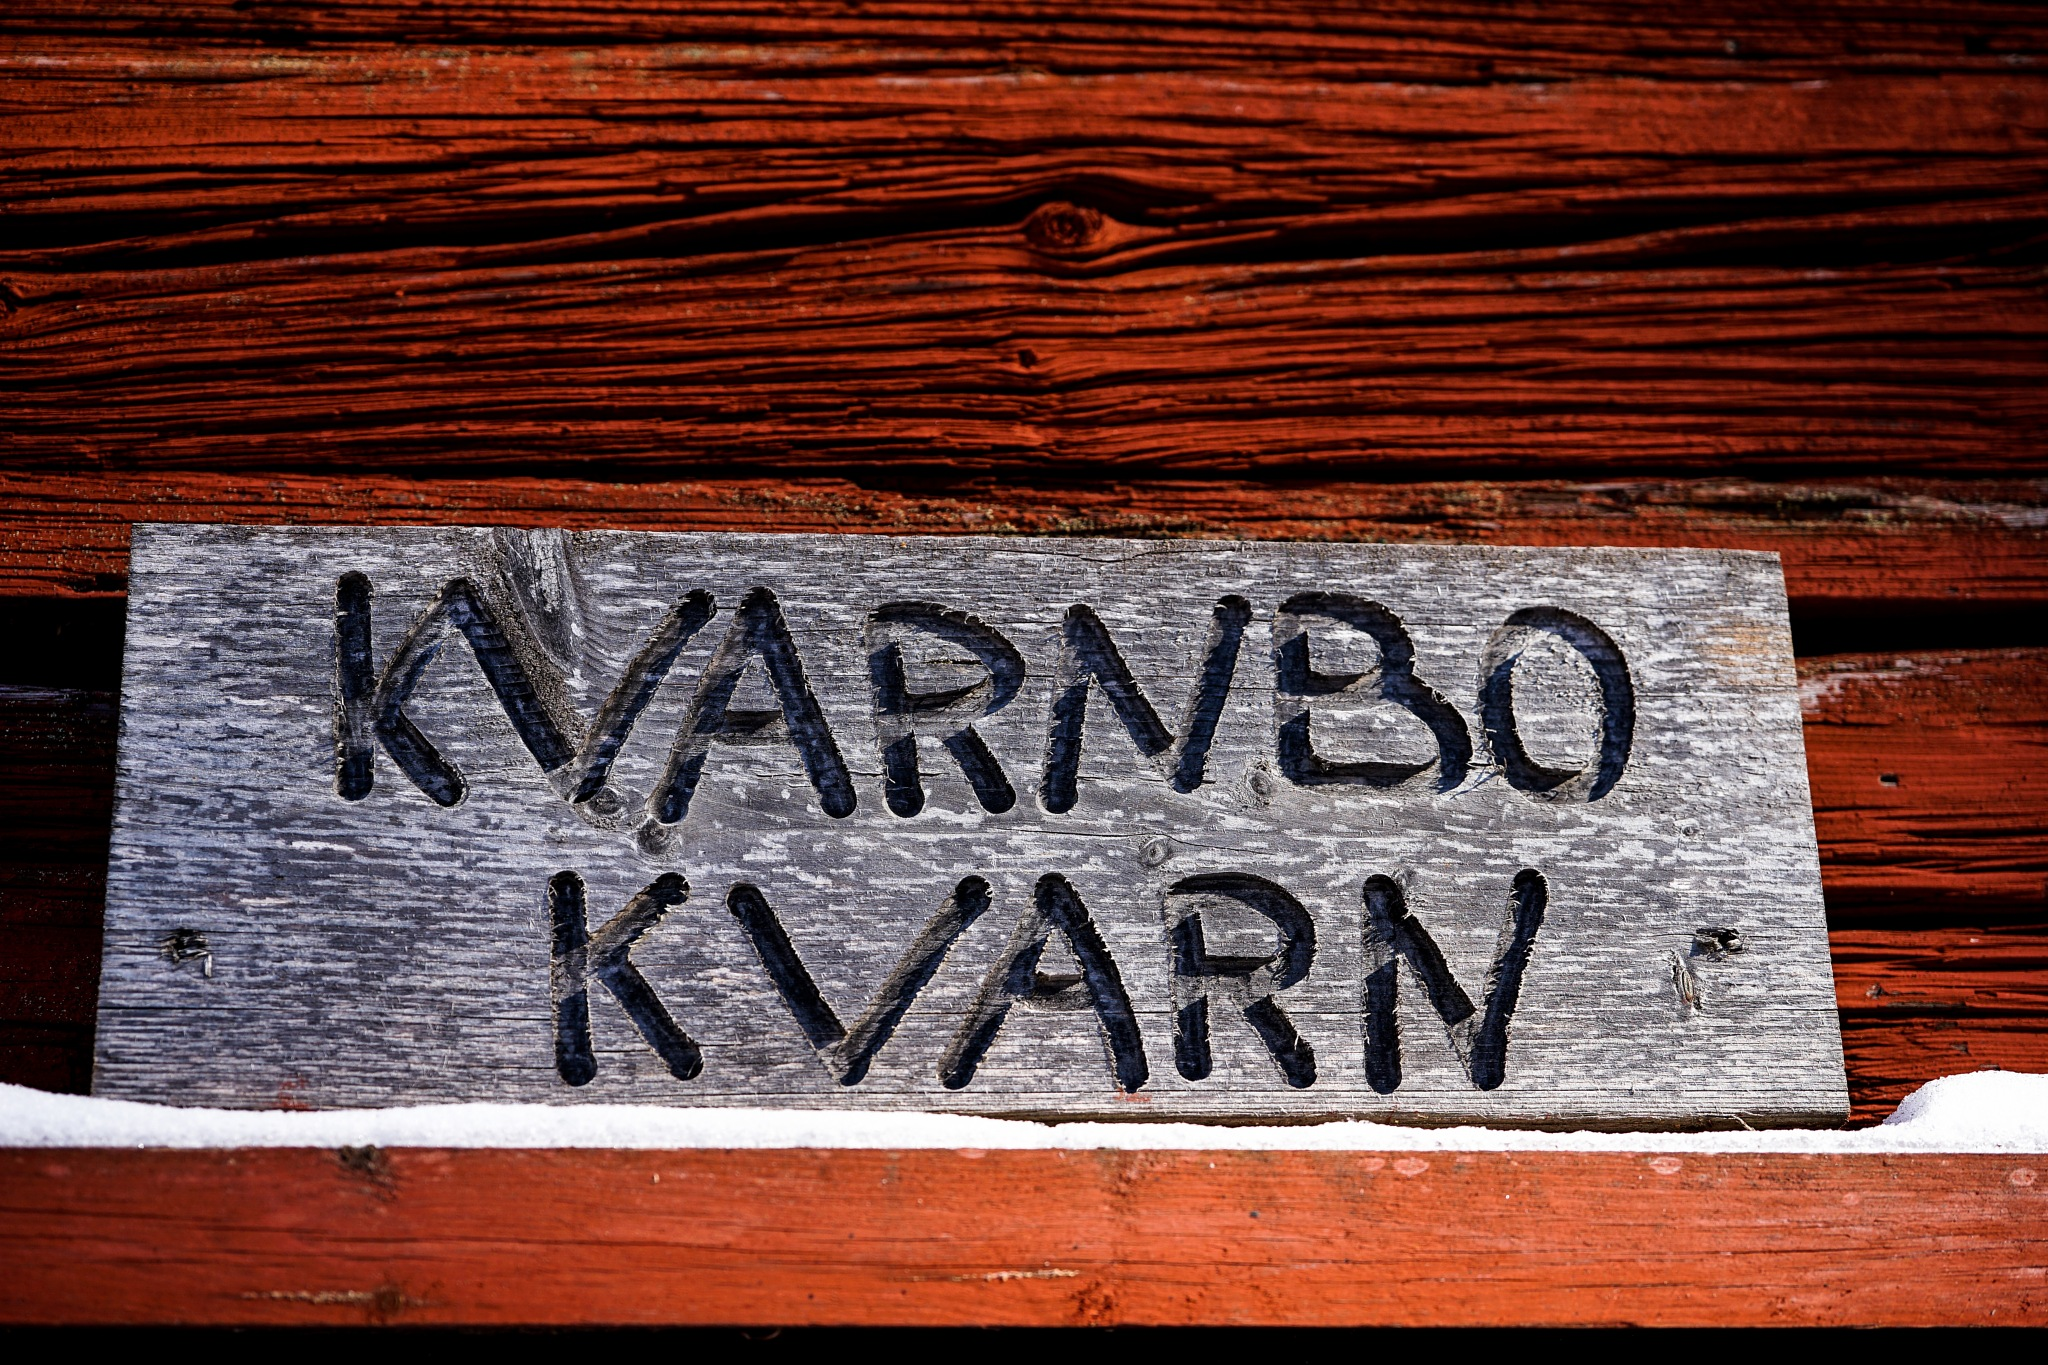 Kvarnbo Kvarn  by Scott Davies